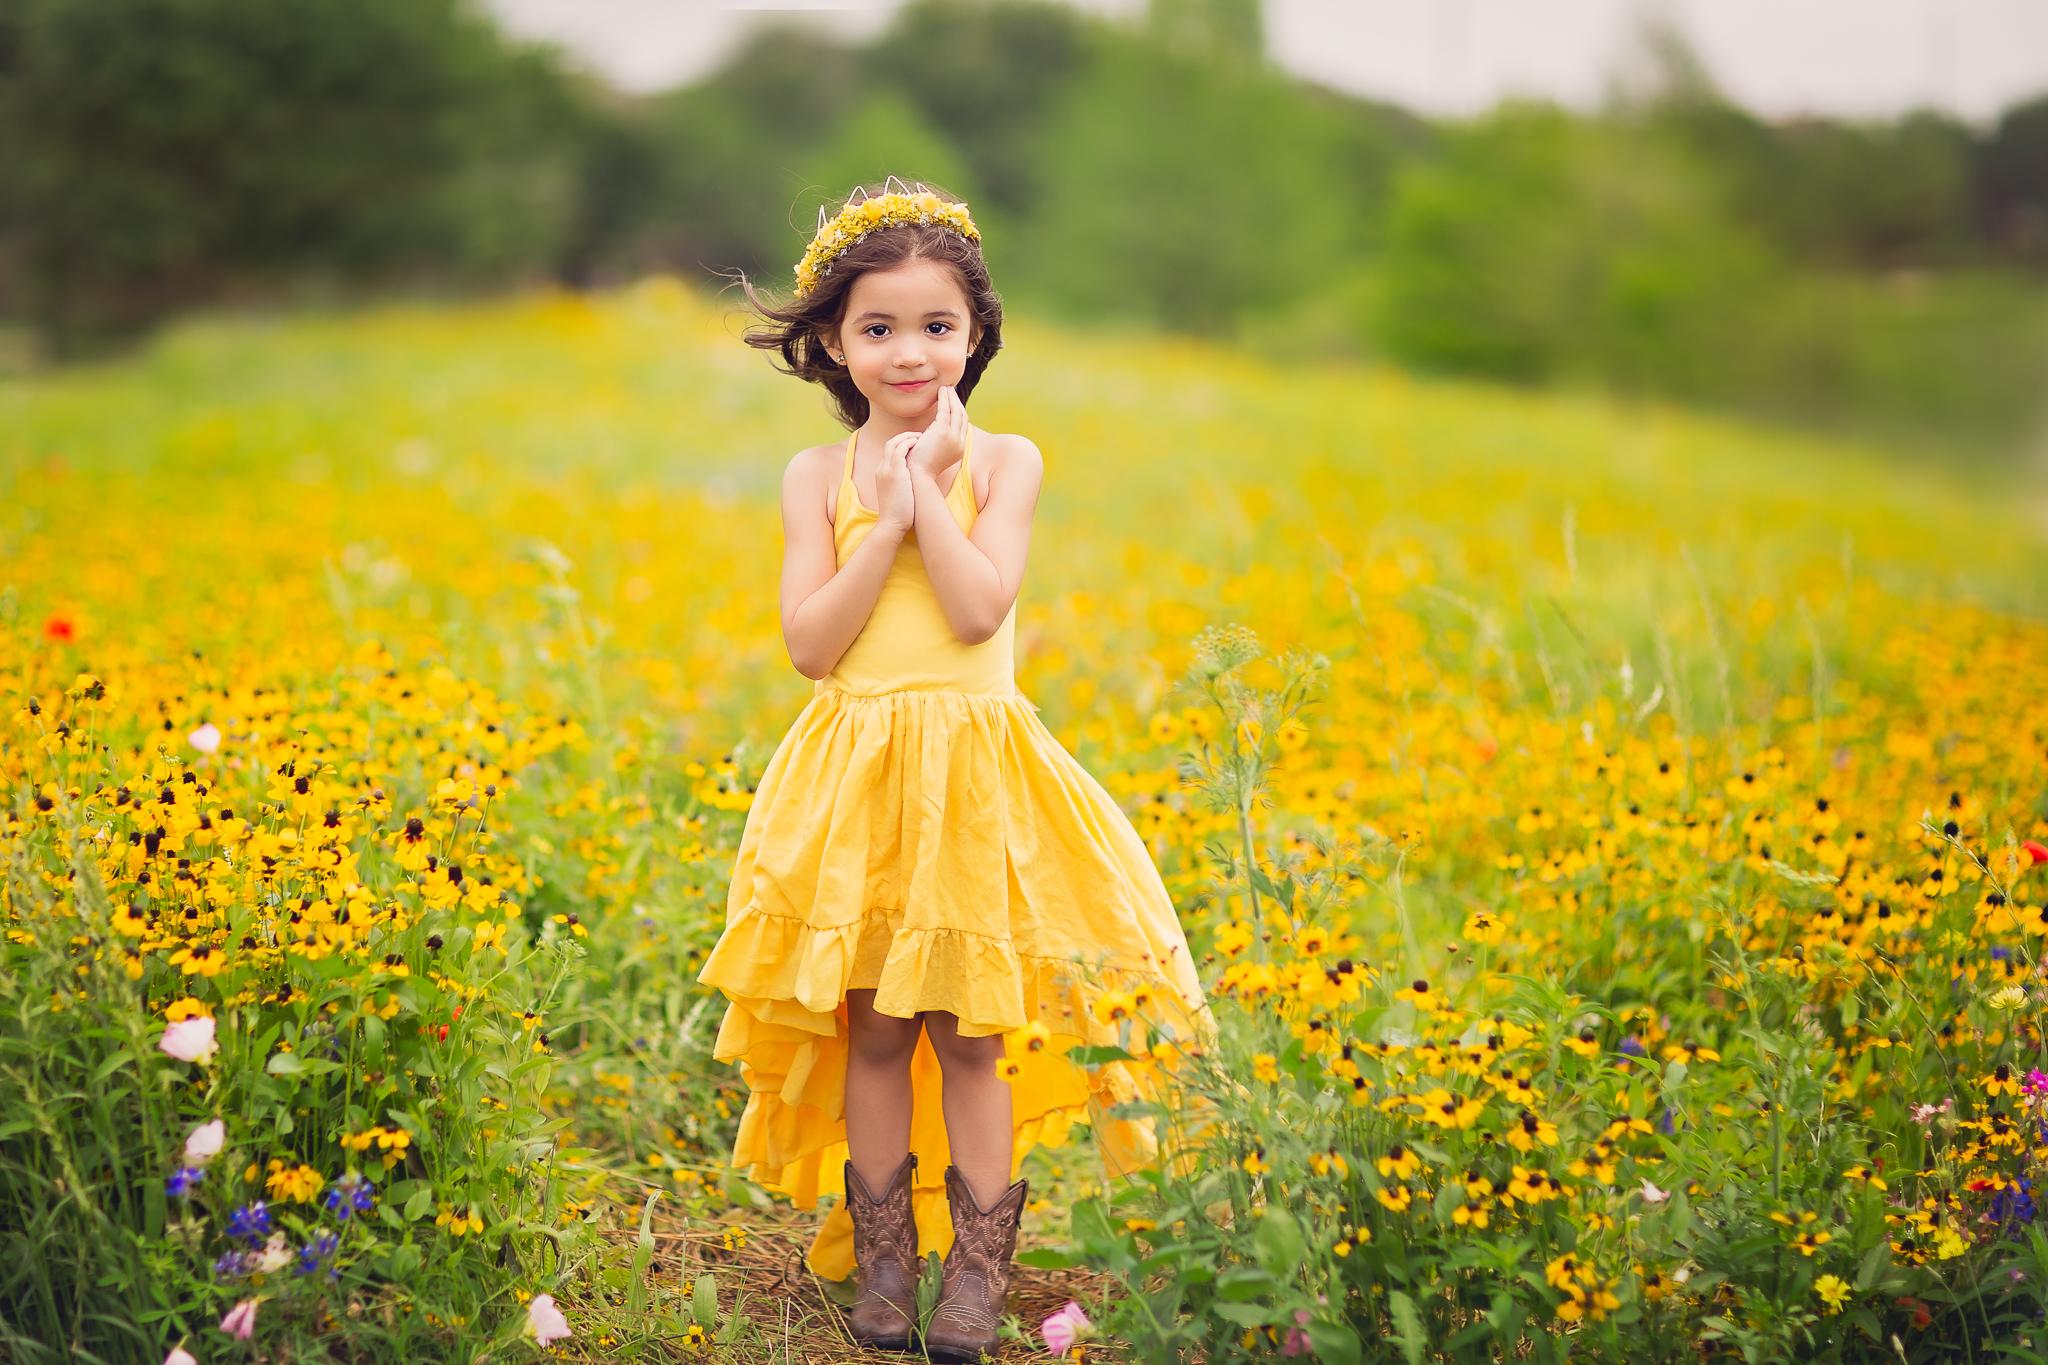 houston-sugar-land-katy-missouri-city-tx-child-family-photographer-outdoor-wildflower-boho-photoshoot.jpg